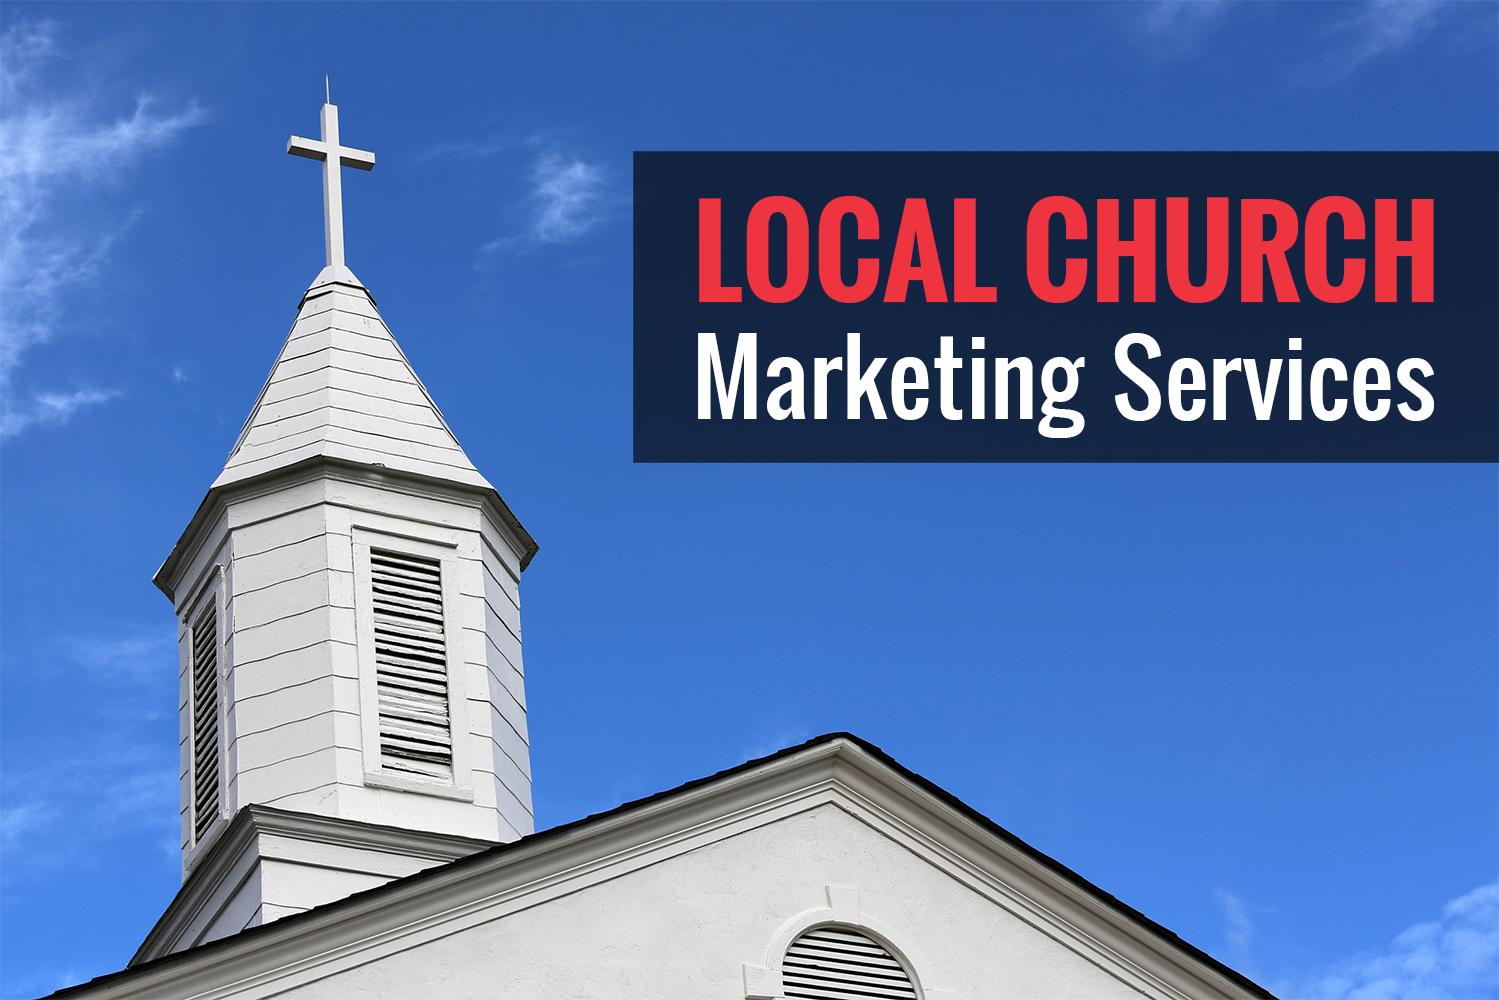 Local Church Marketing Services